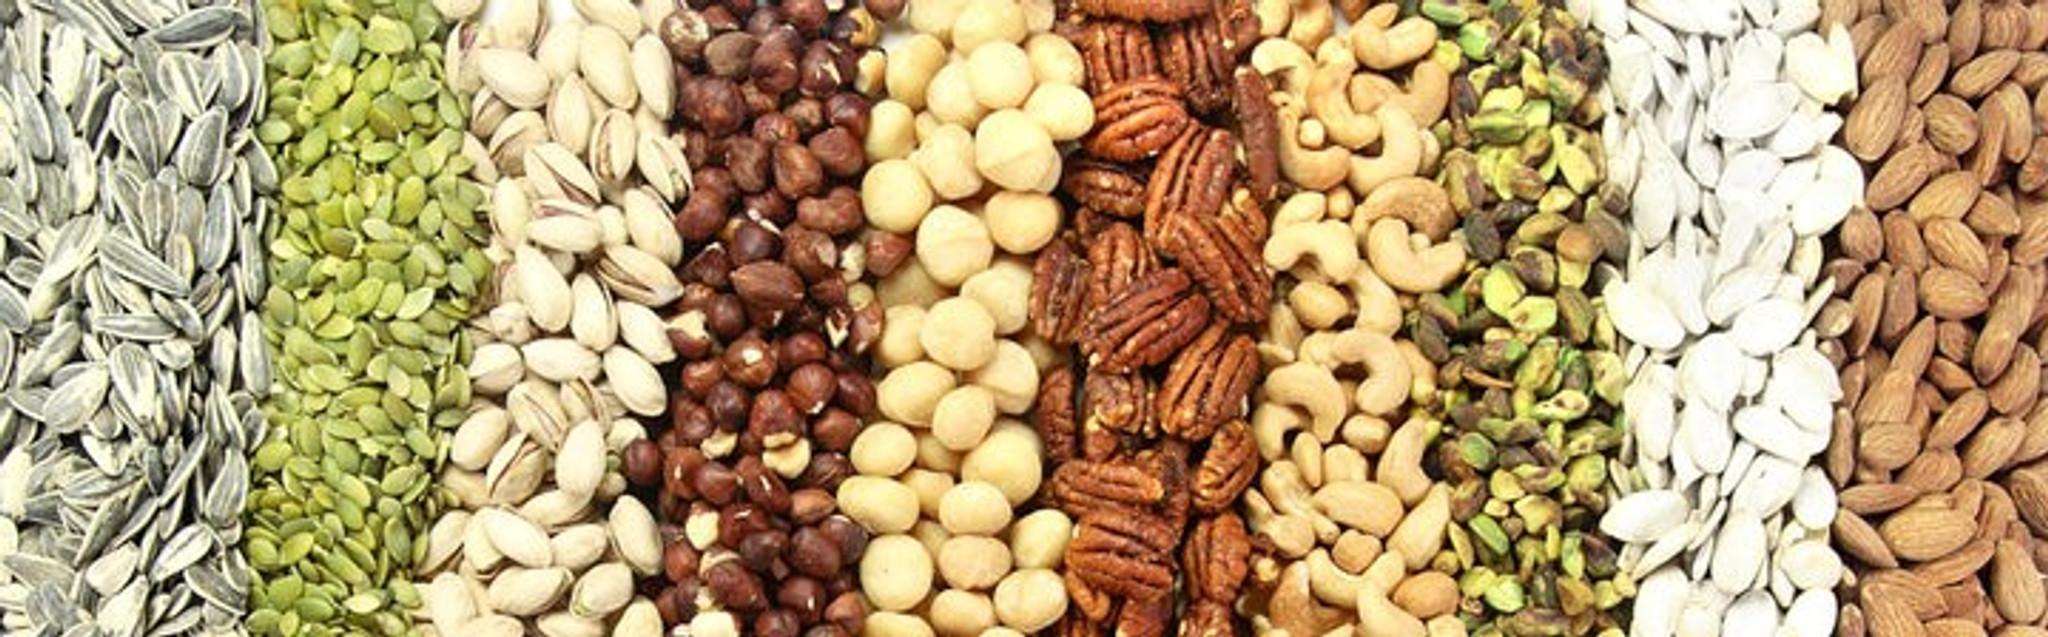 Dry Roasted Nuts - austiNuts in Austin, TX